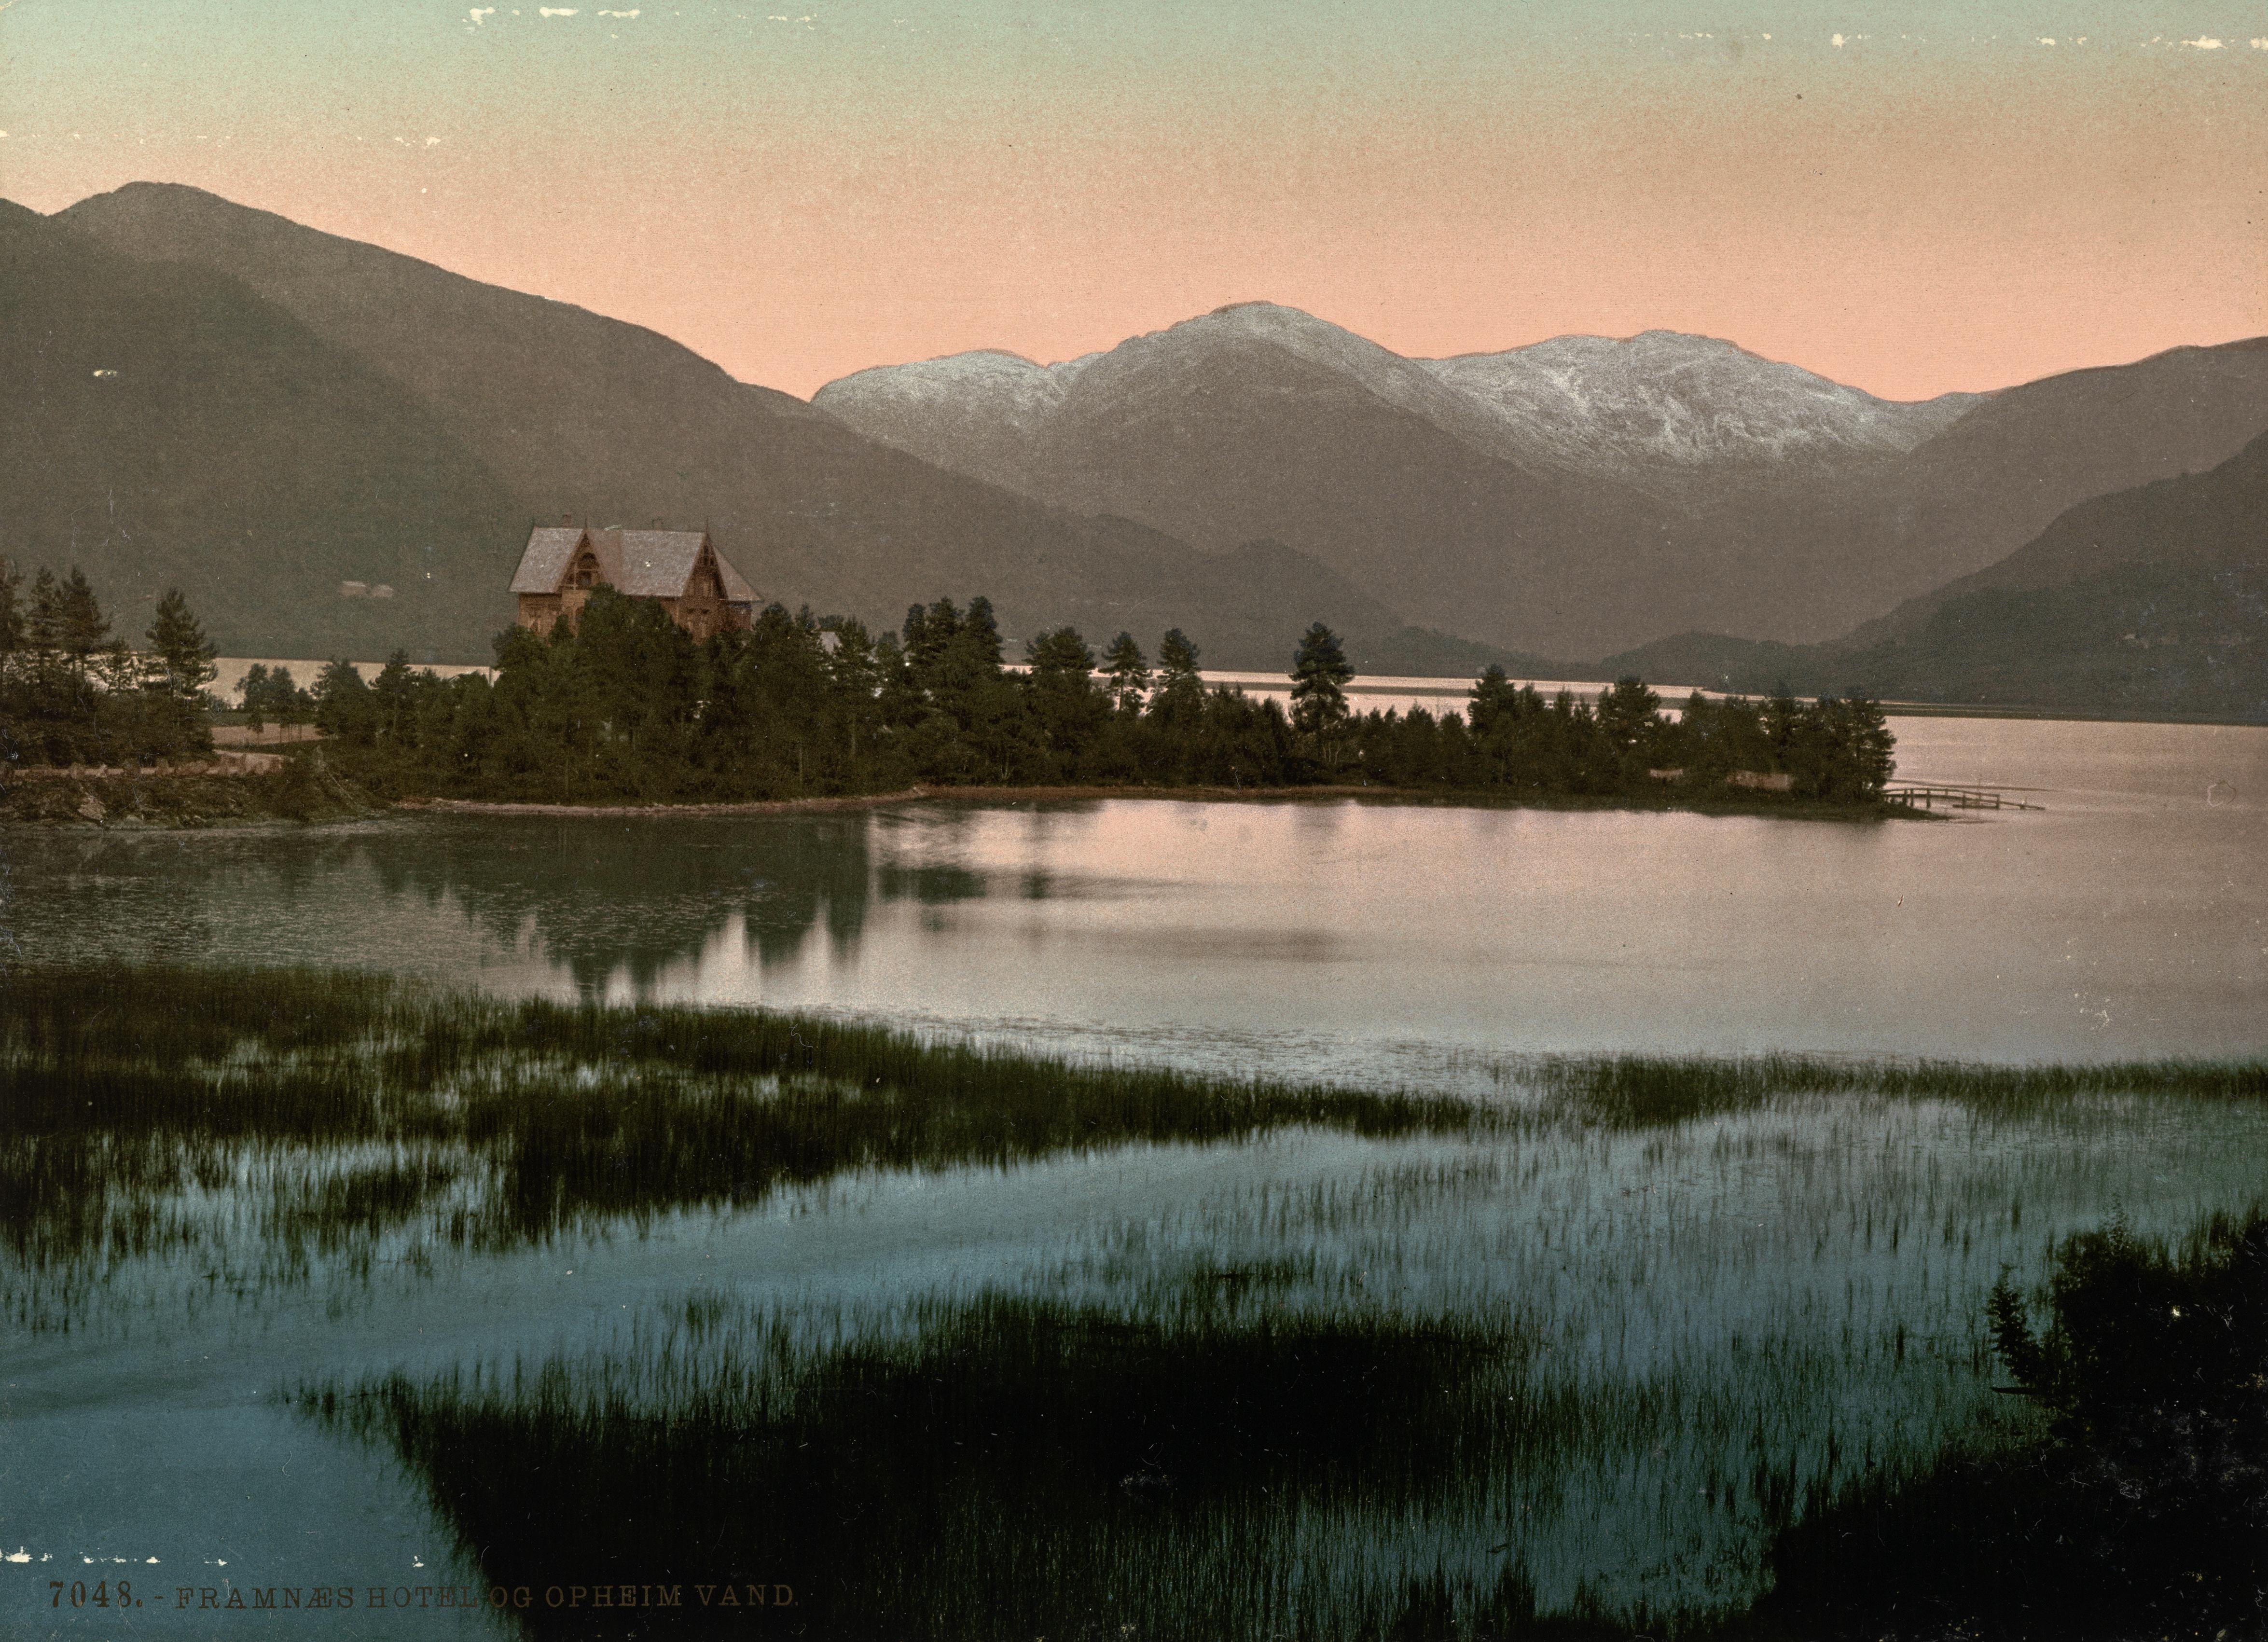 7048. Framnæs Hotel og Opheim Vand